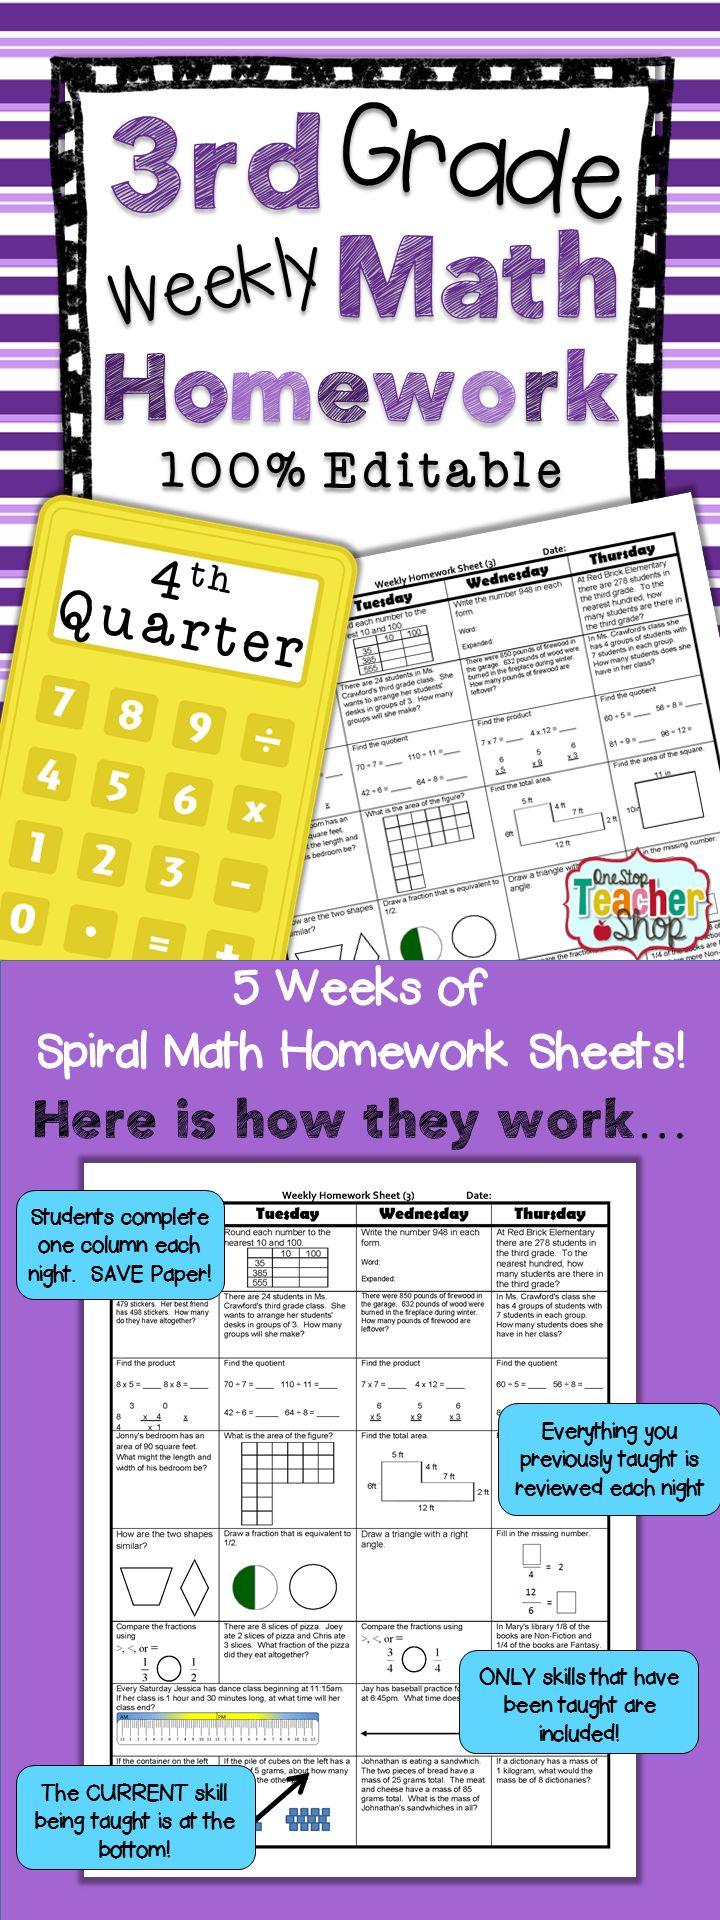 3rd Grade Math Review & Quizzes Homework or Morning Work